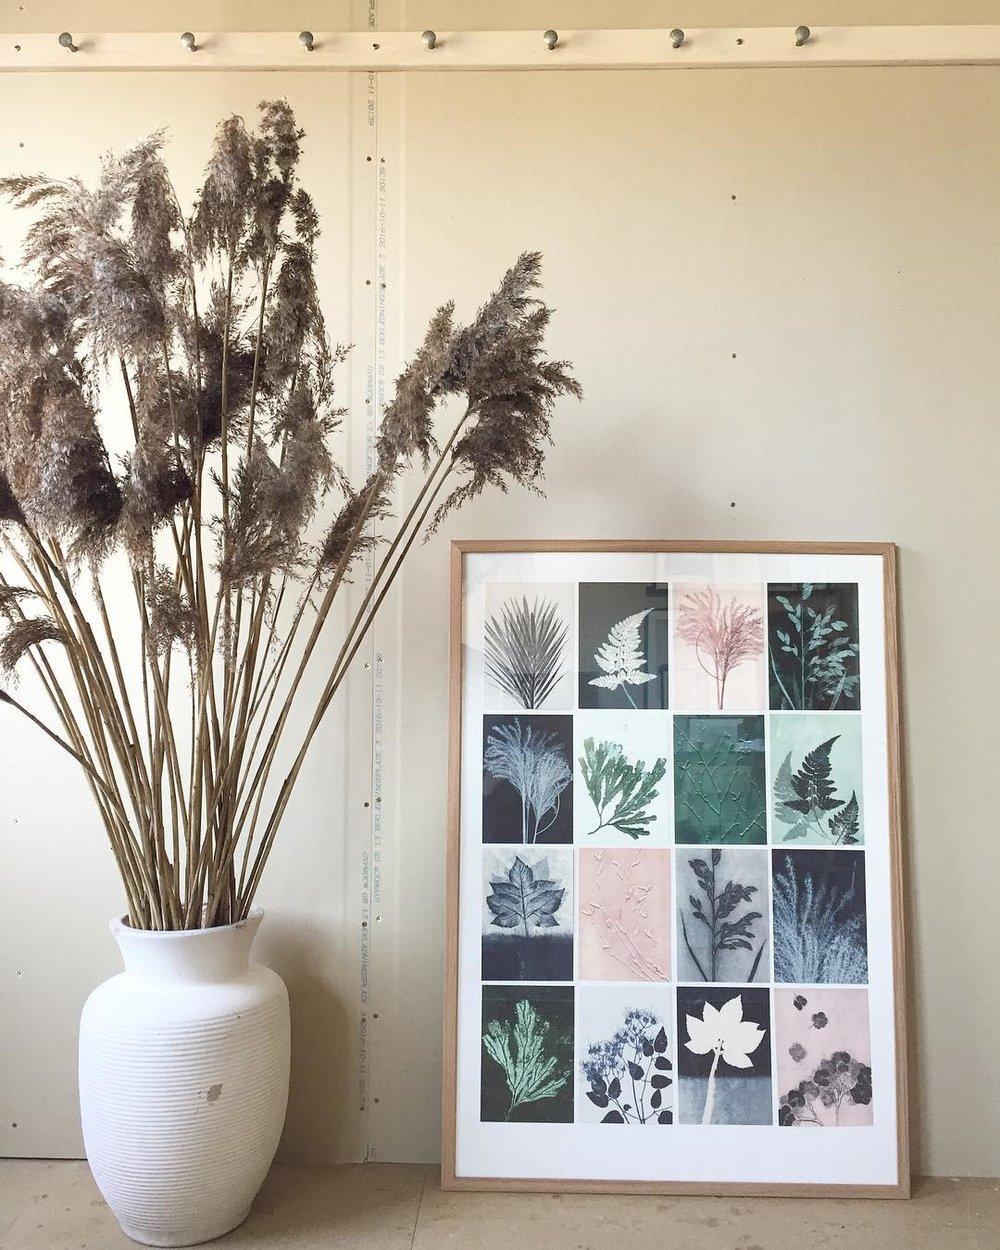 16 prints of A5 size